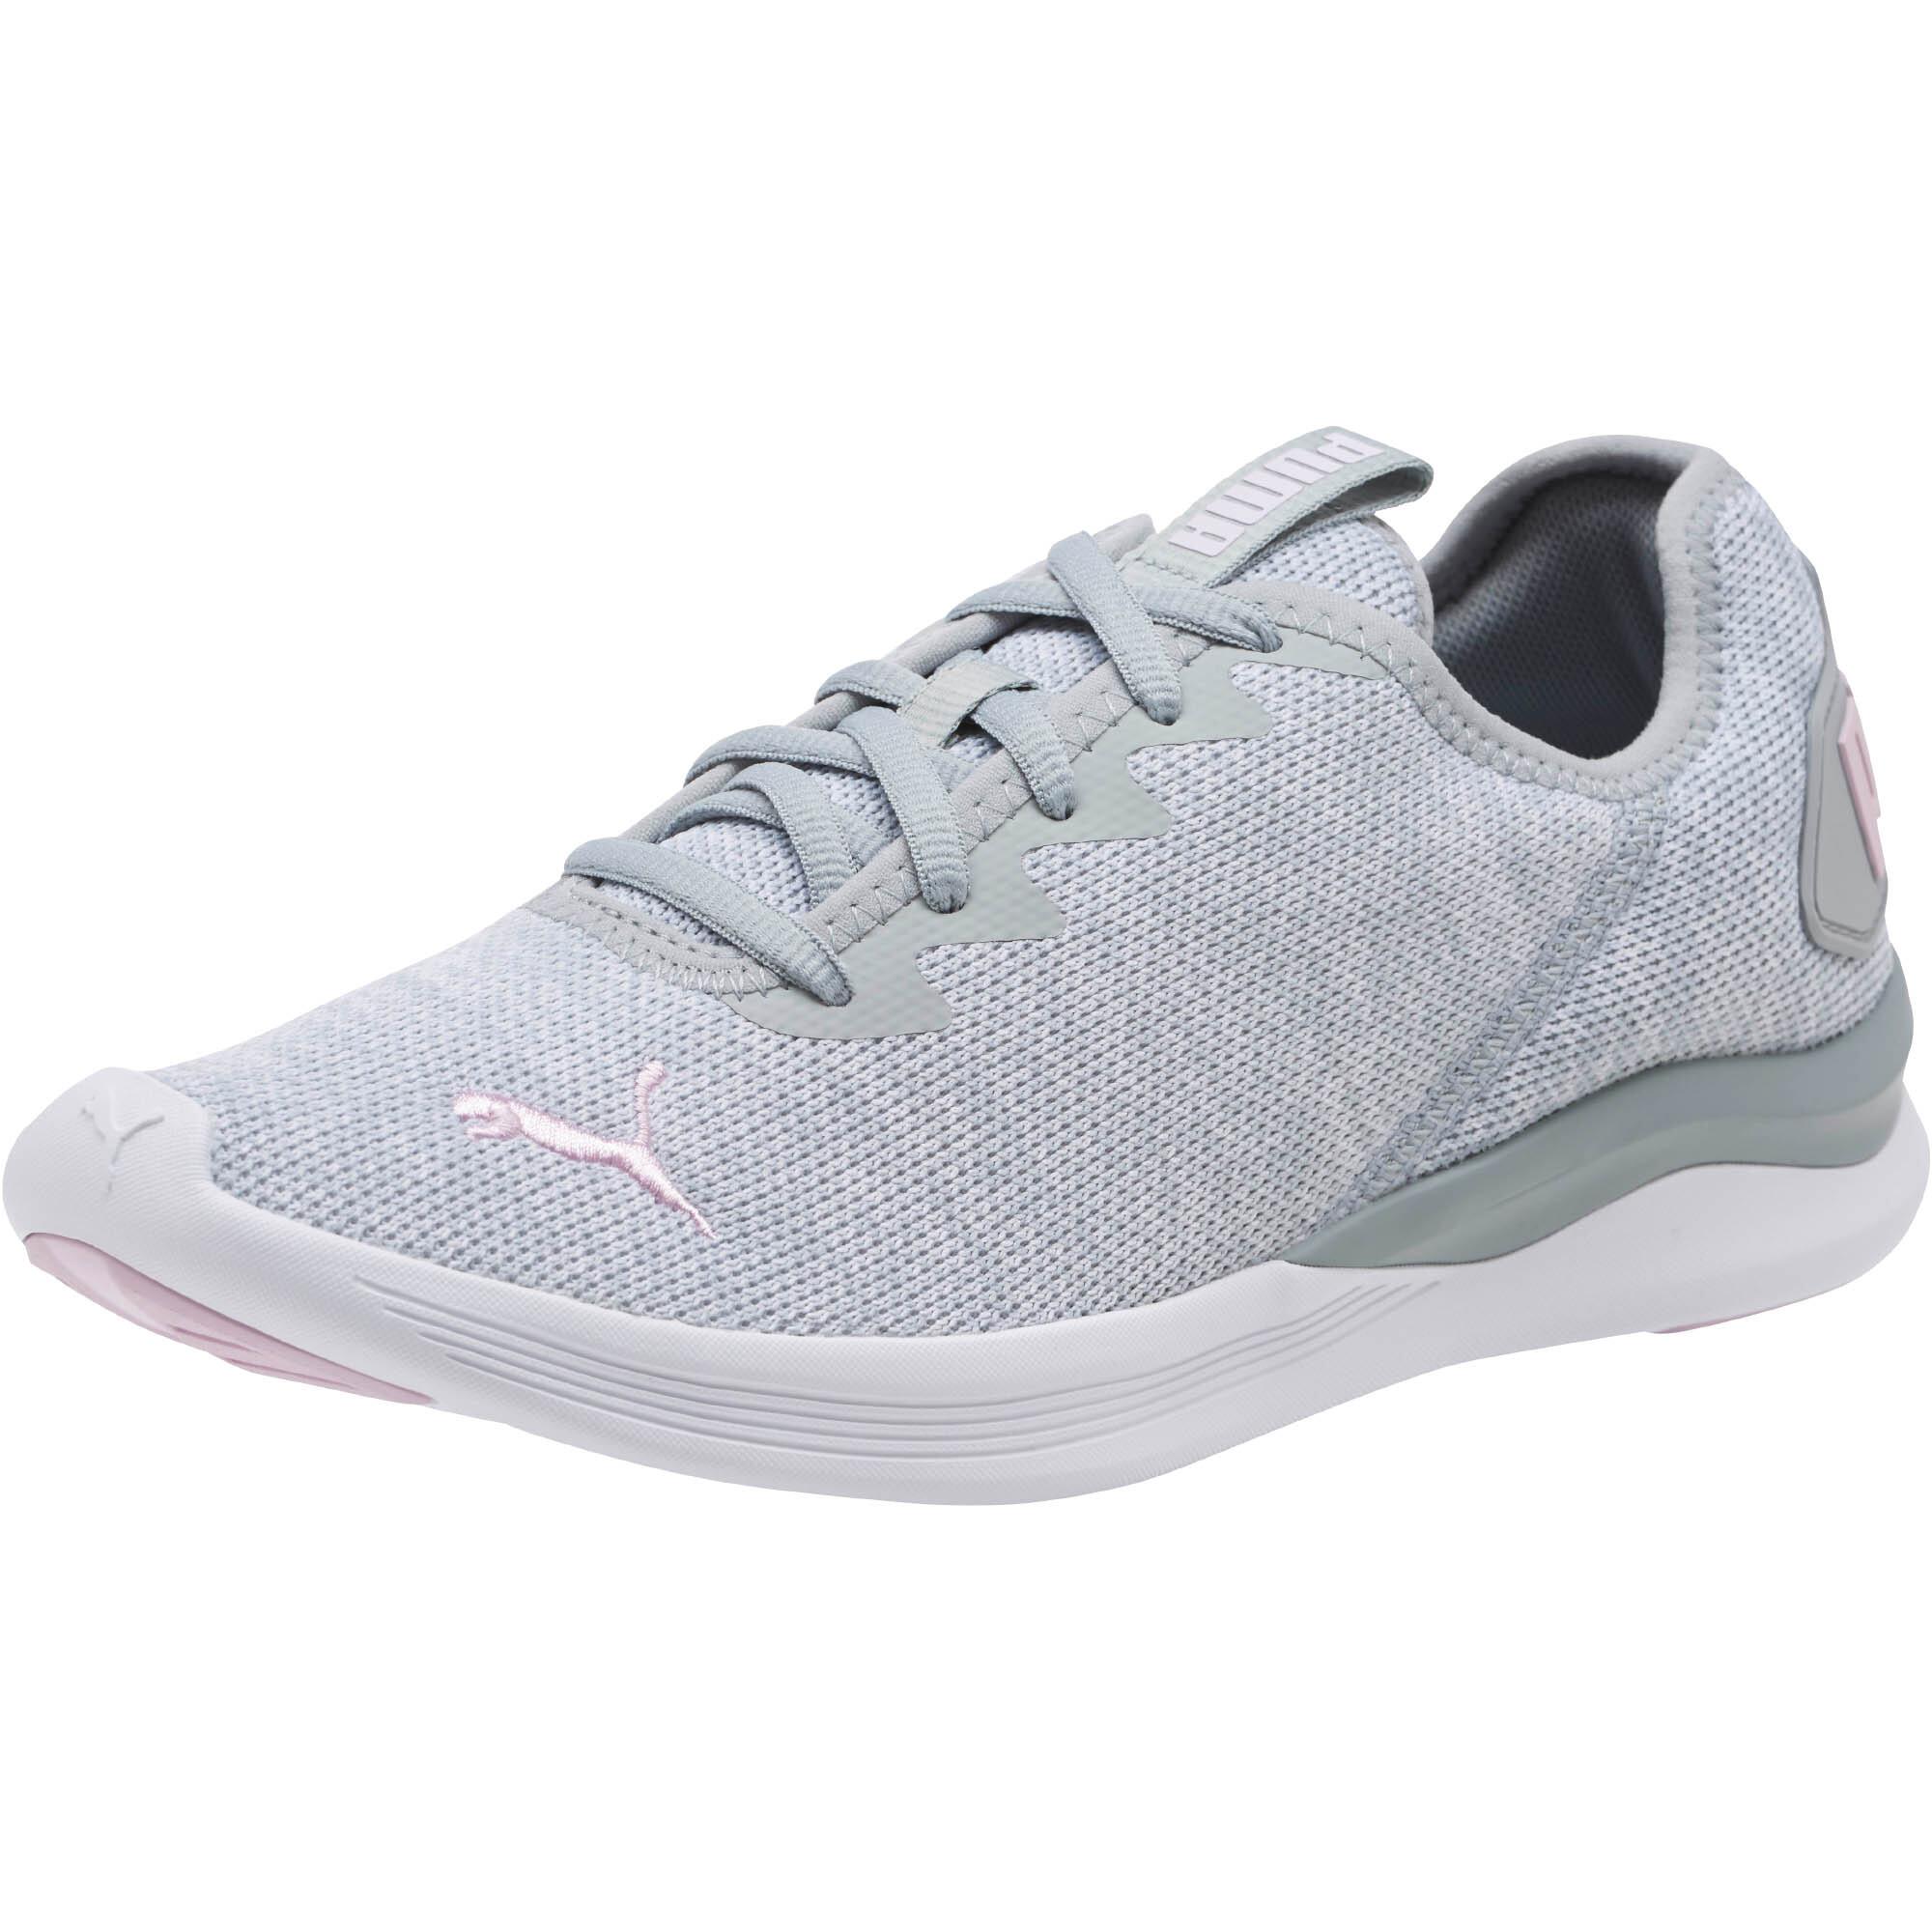 PUMA-Ballast-Women-039-s-Running-Shoes-Women-Shoe-Running thumbnail 19